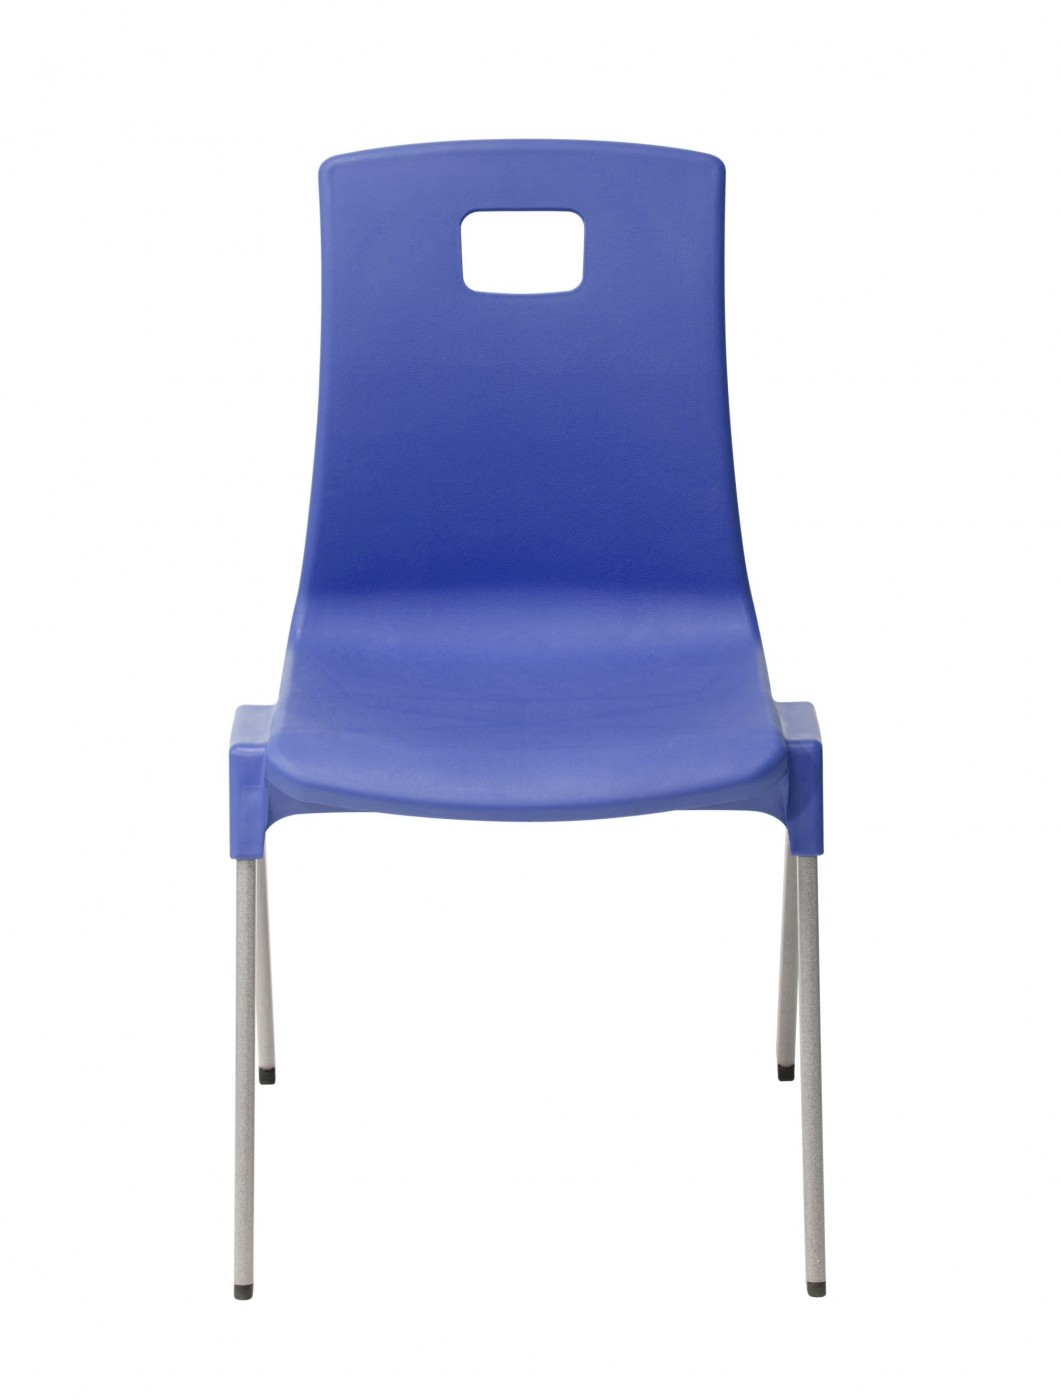 Classroom Furniture Uk : Metalliform st polyprop stacking classroom chair